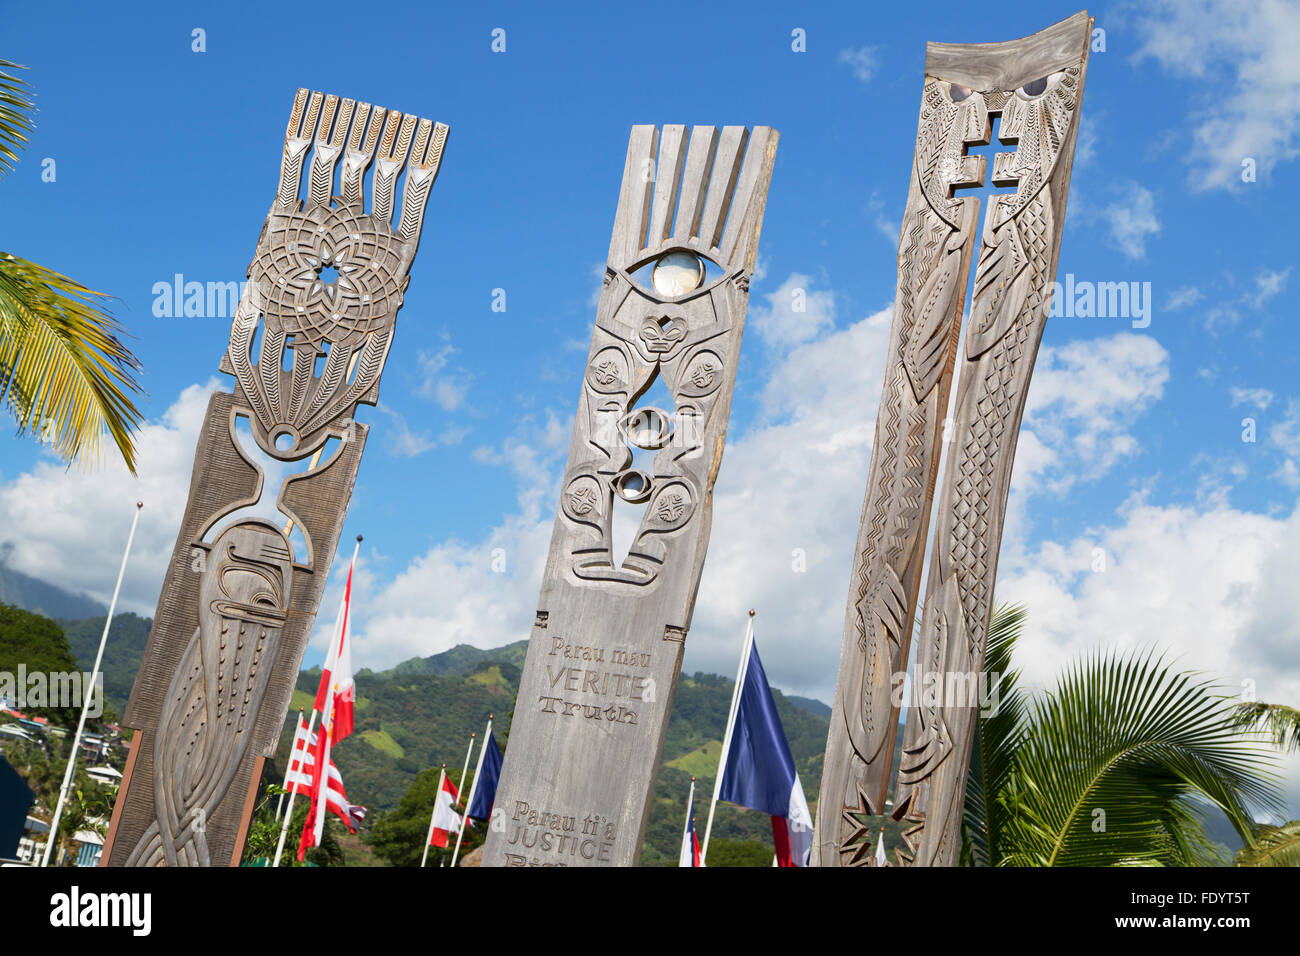 Memorial to nuclear testing in Jardins de Paofai, Pape'ete, Tahiti, French Polynesia Stock Photo